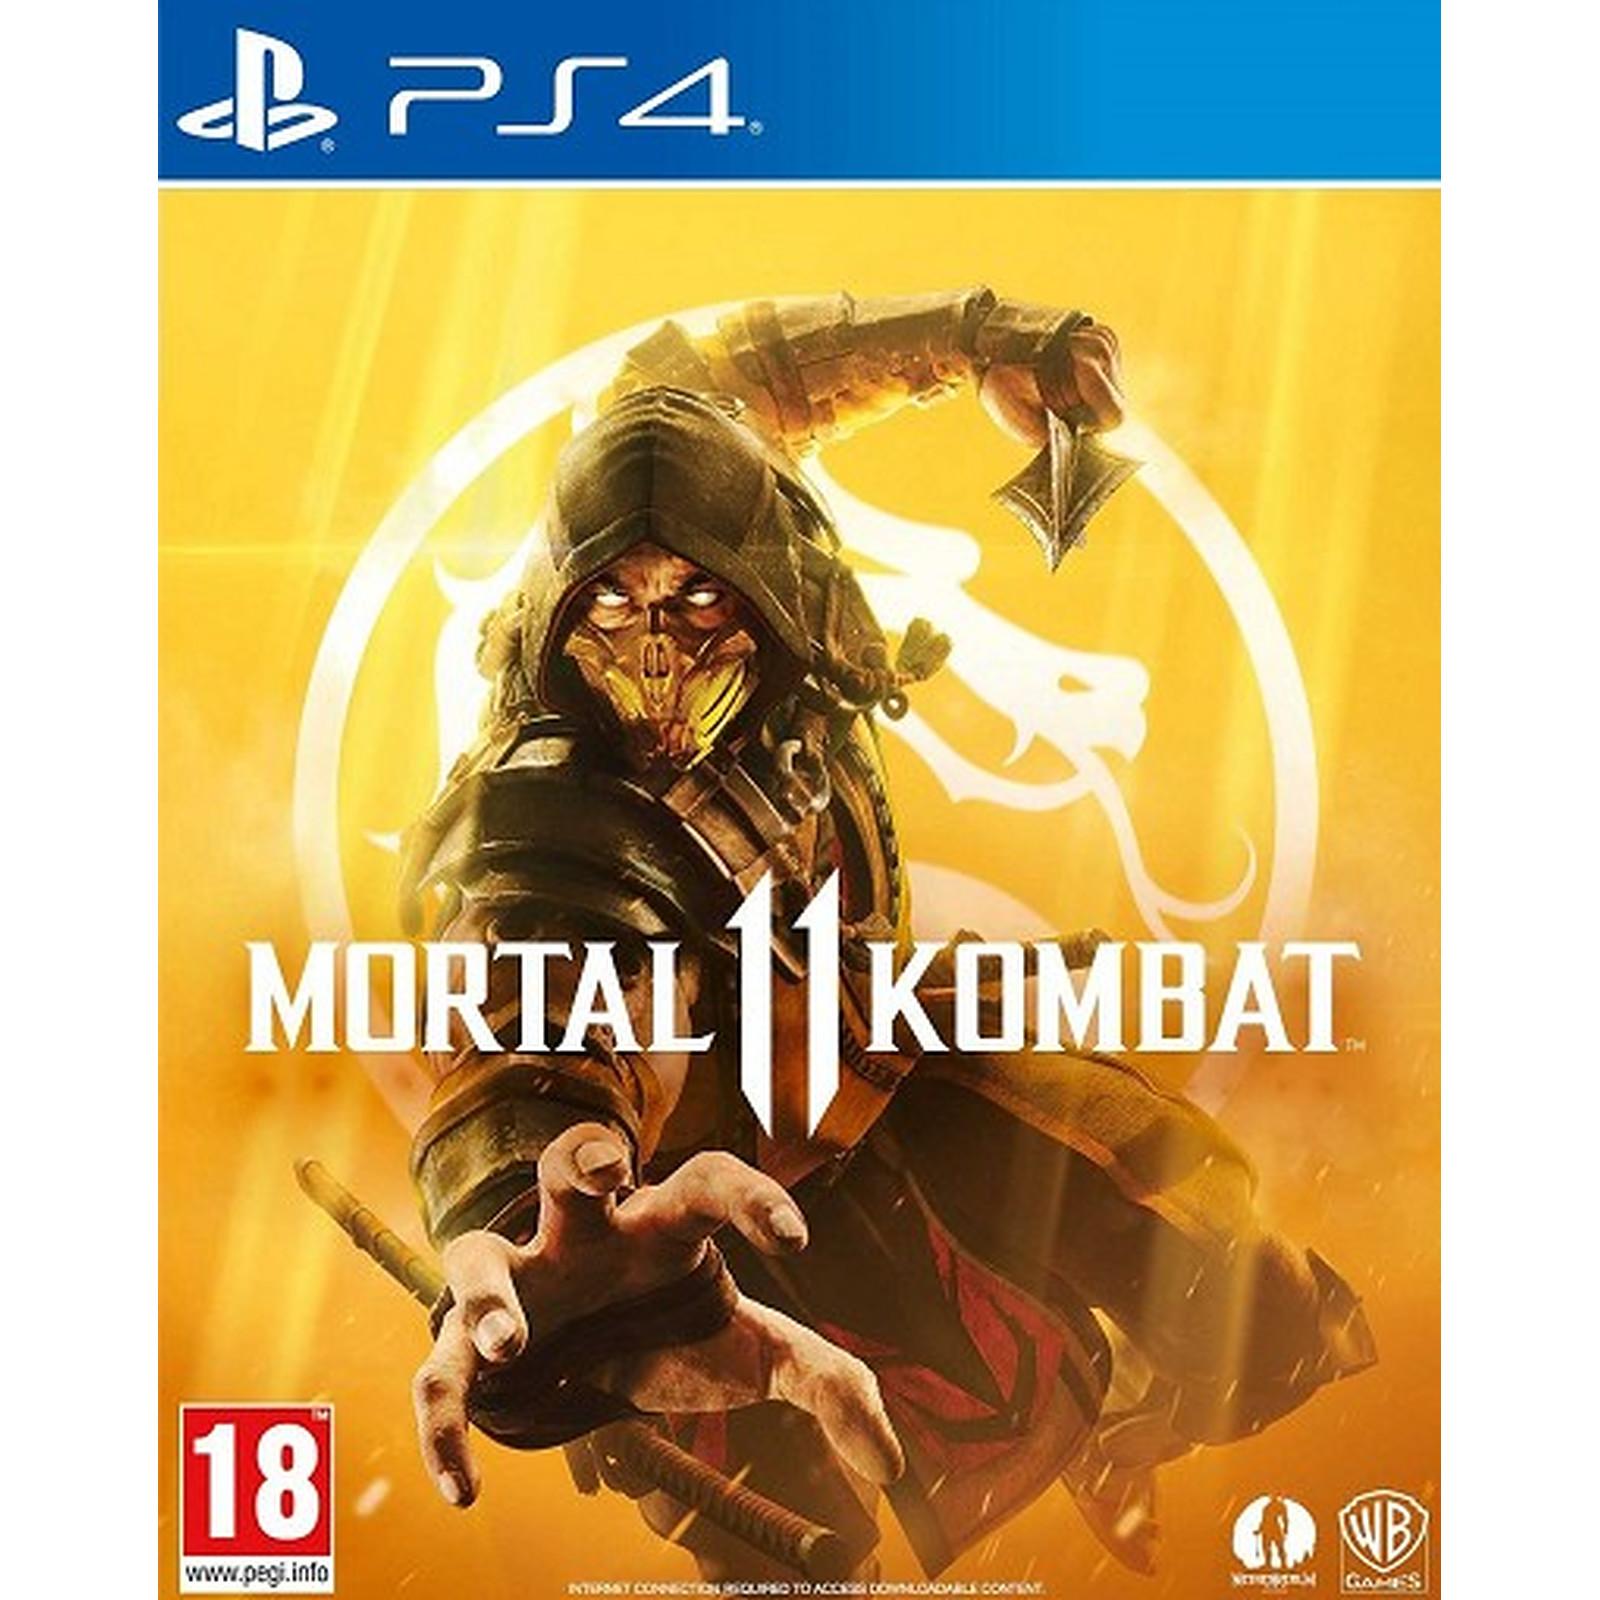 Mortal Kombat 11 (PS4)